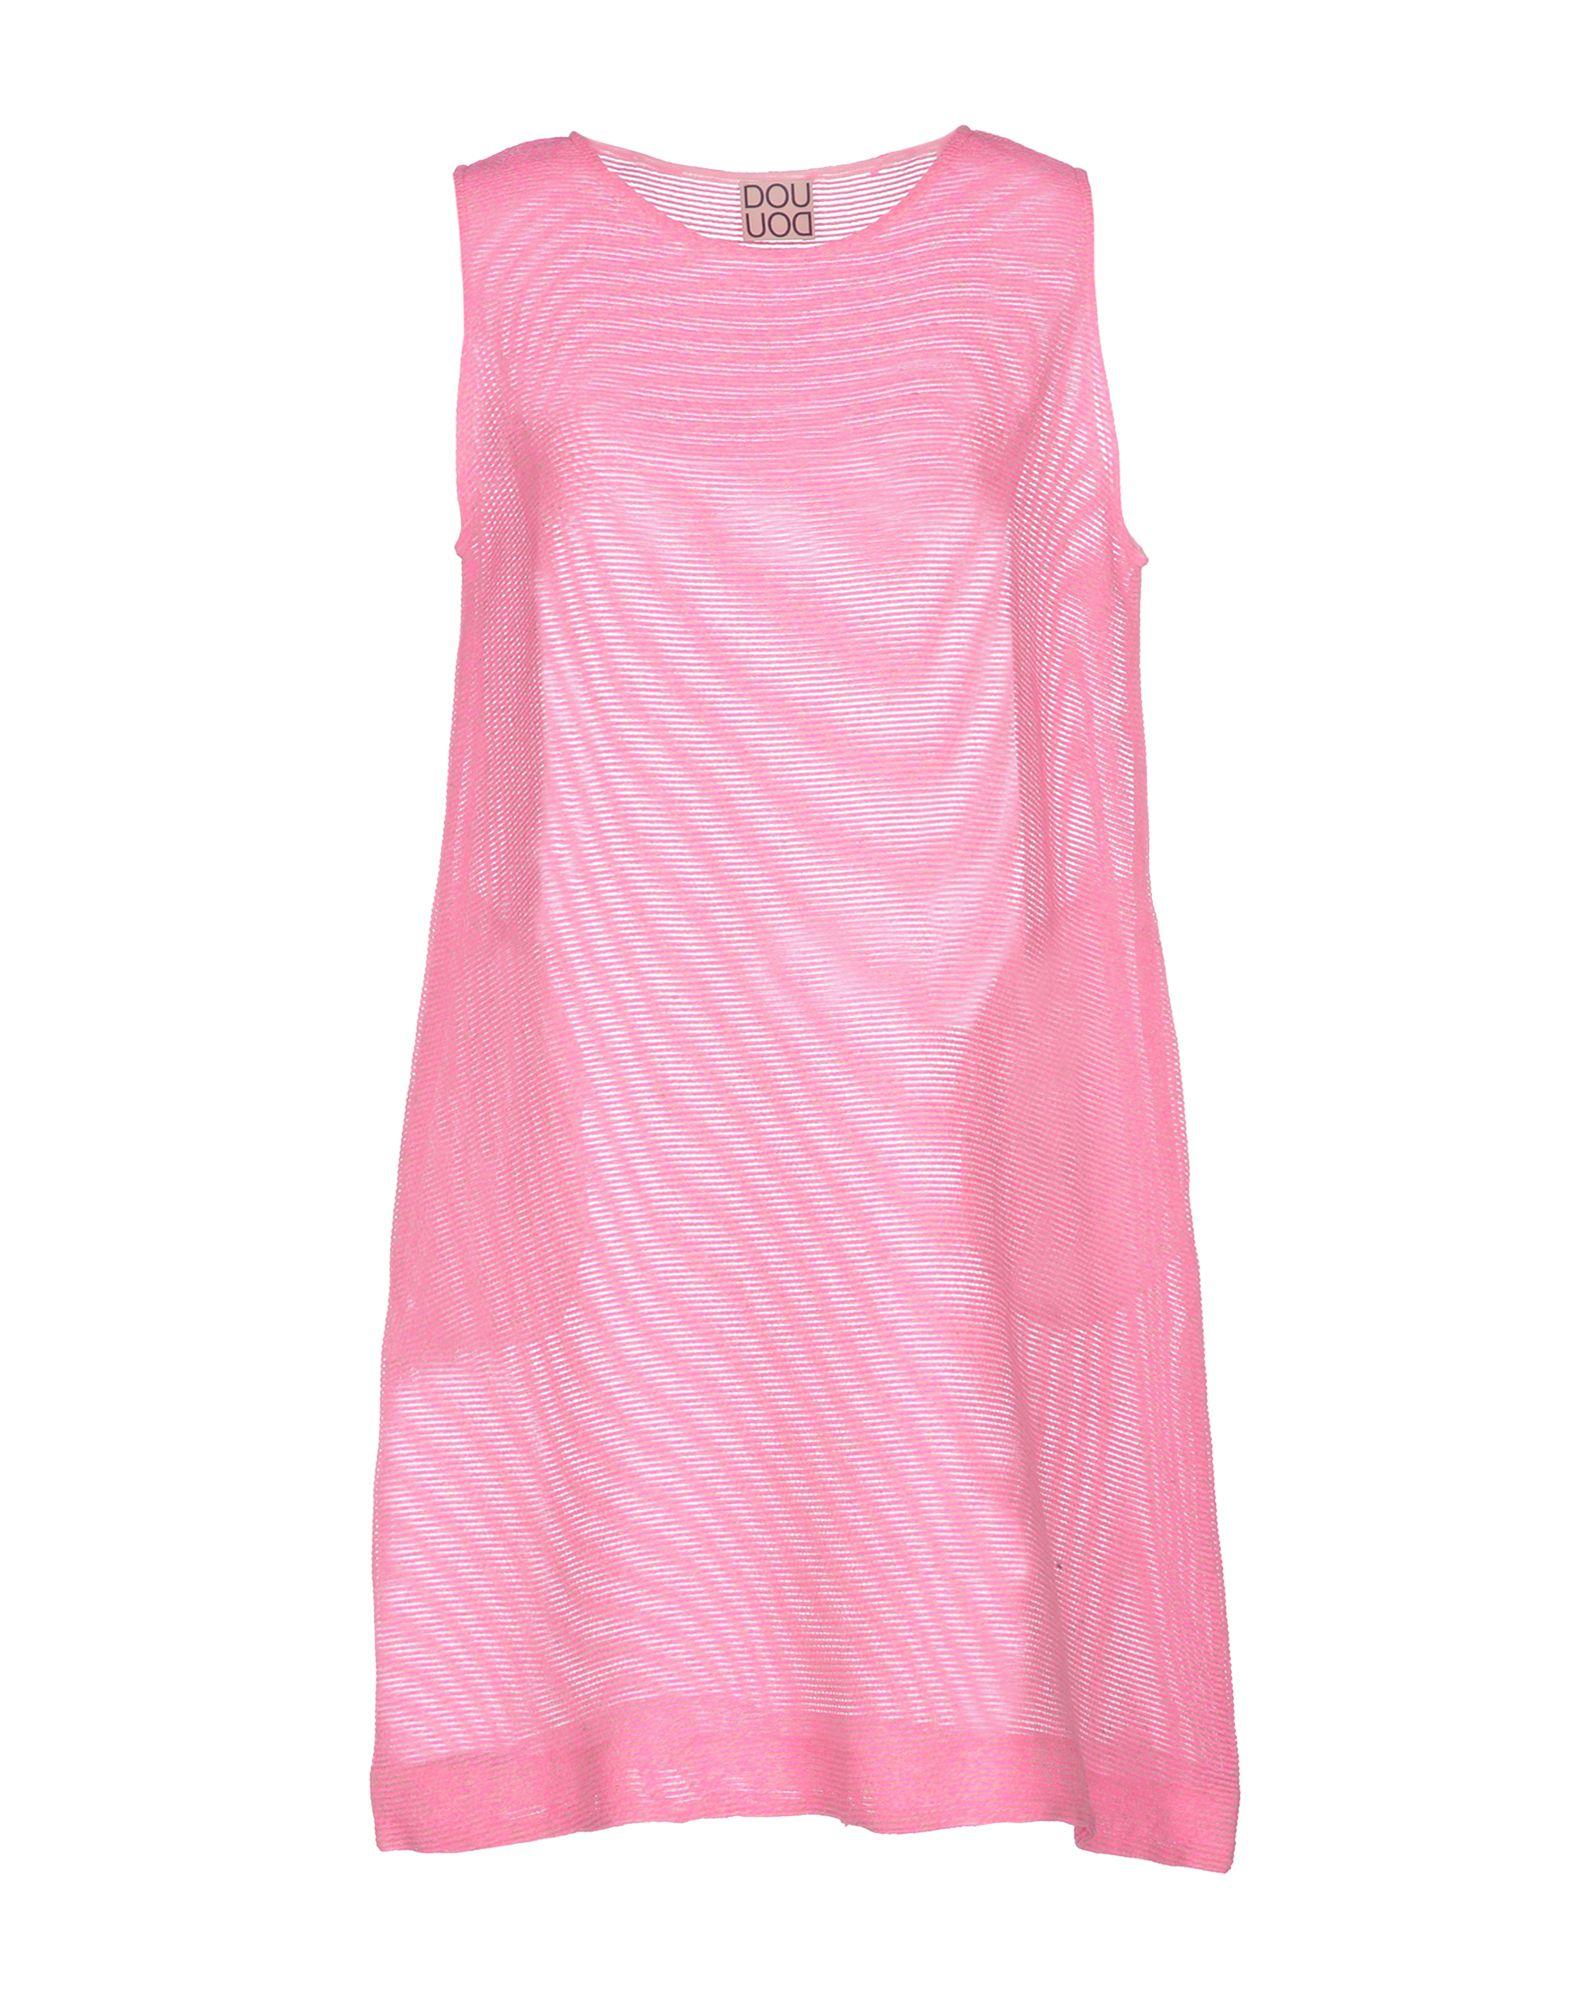 DOUUOD Short Dress in Fuchsia